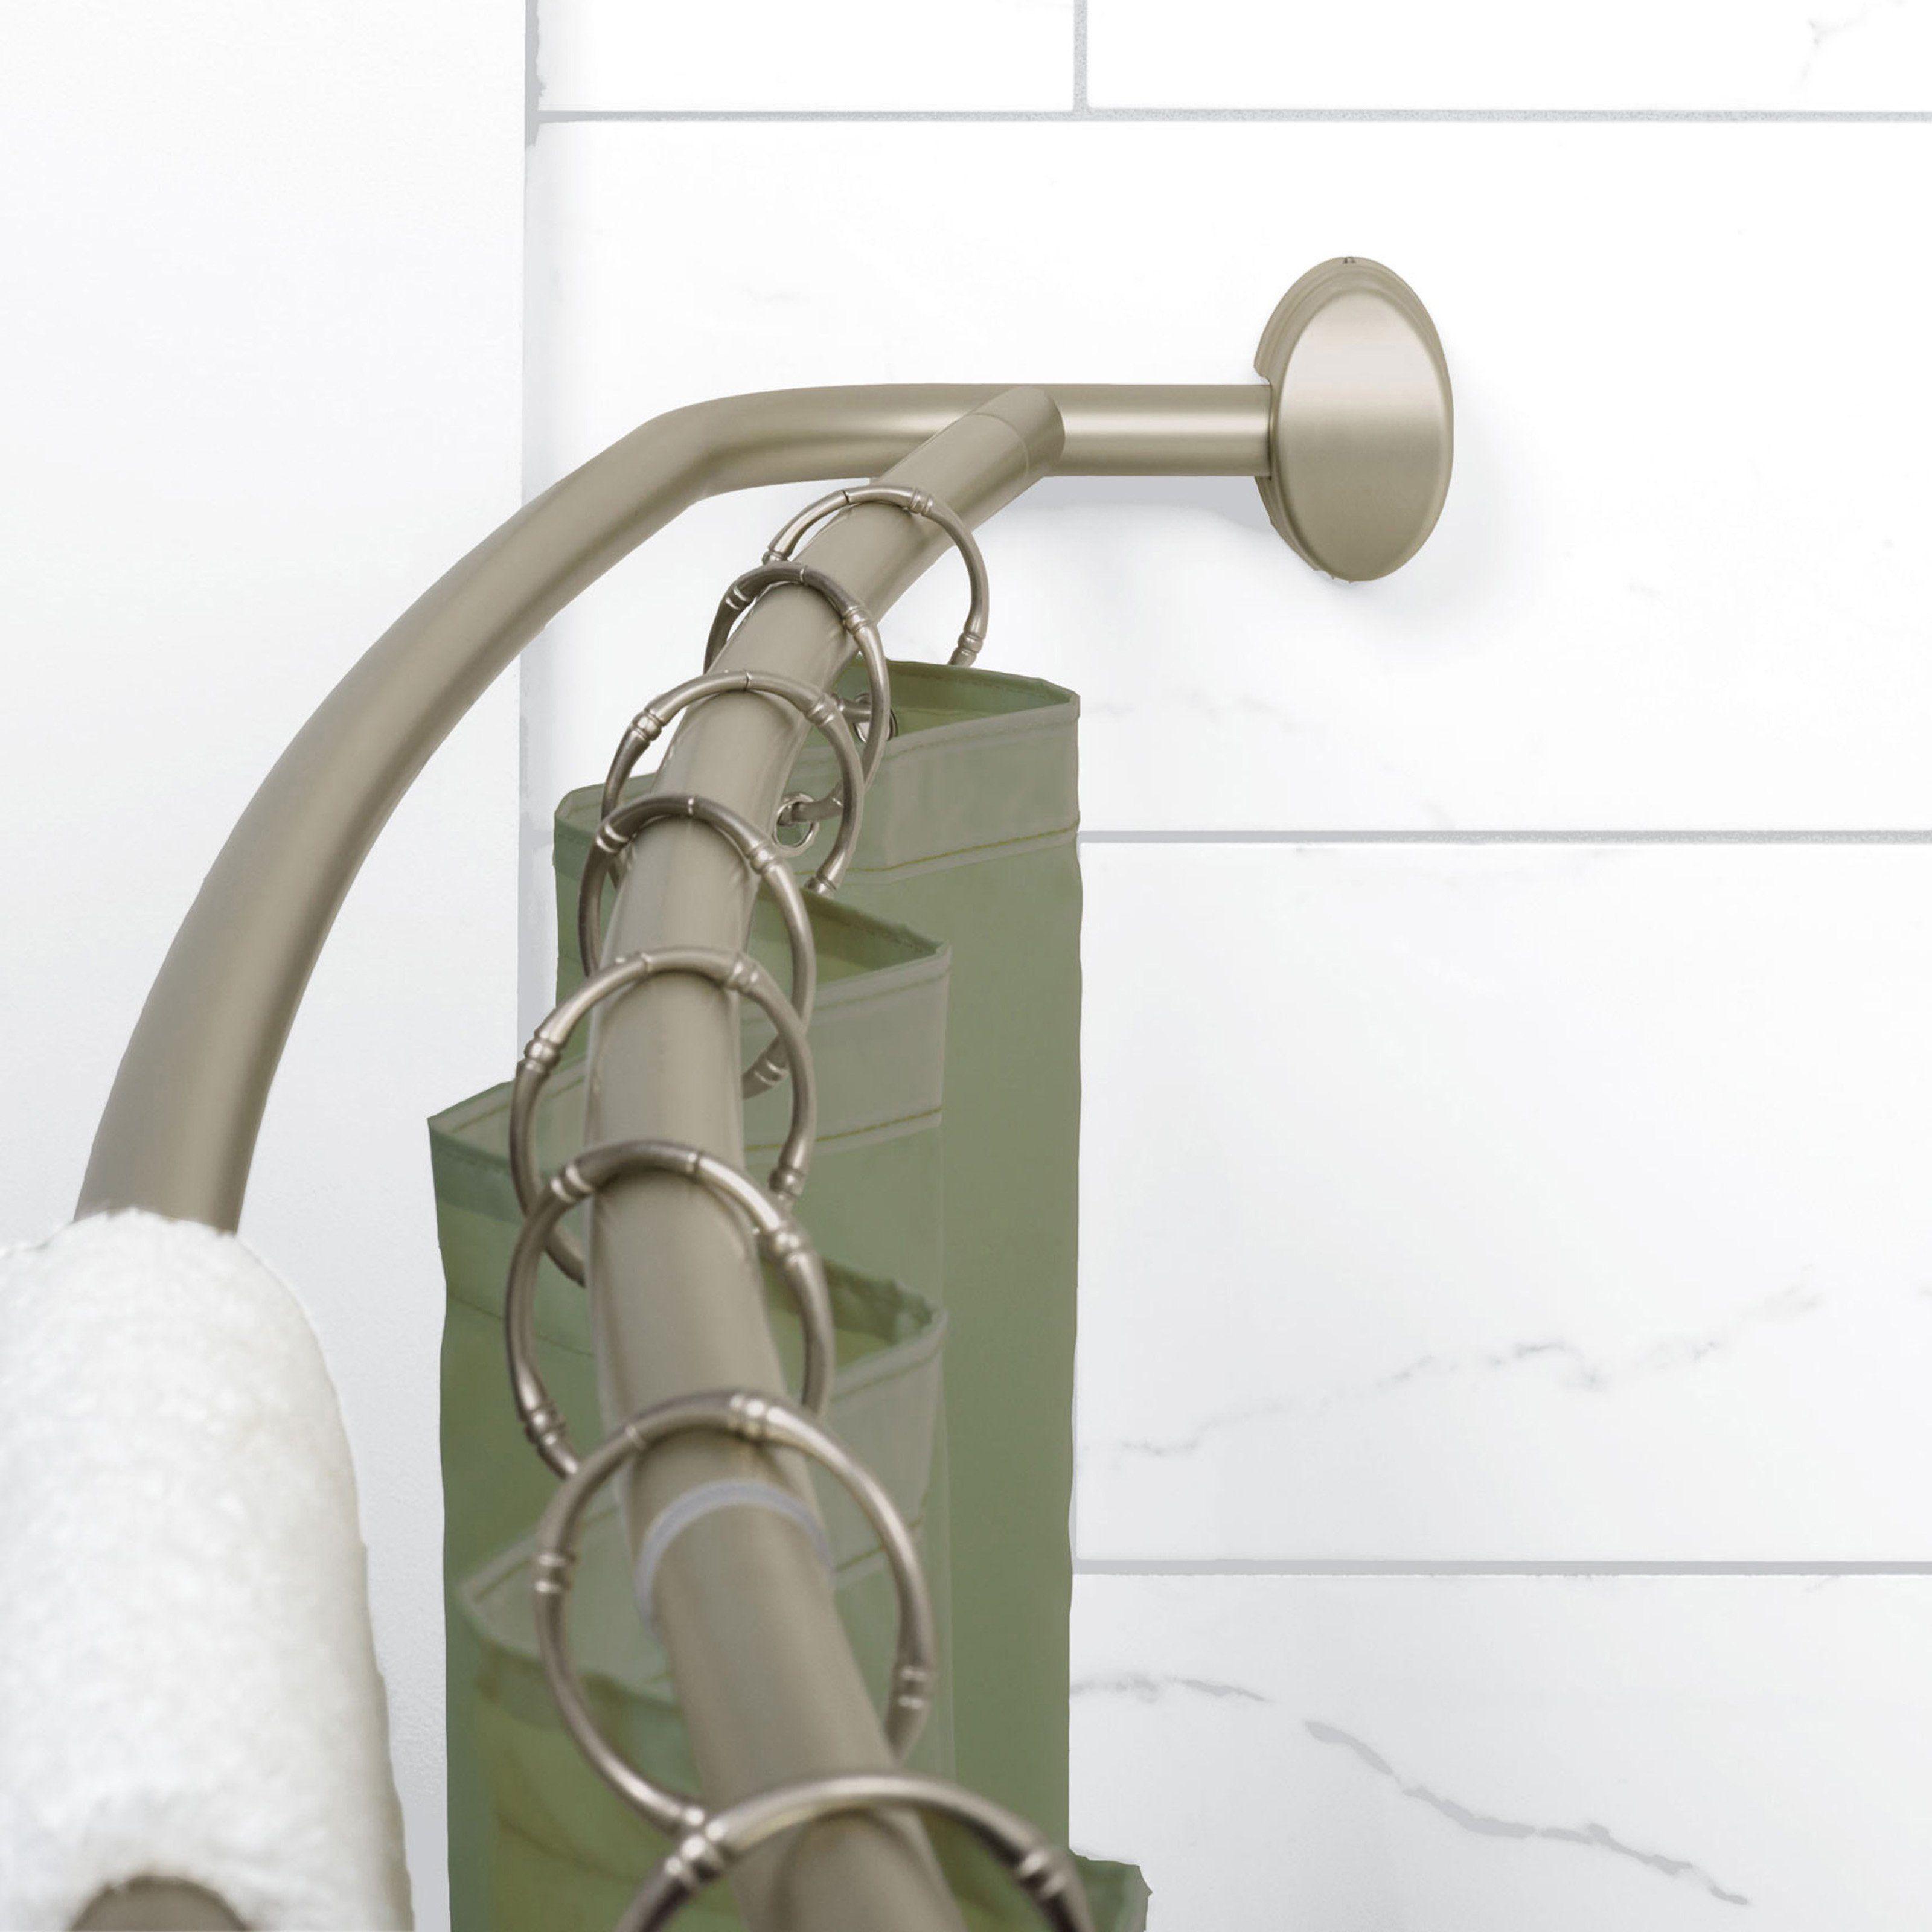 Zenith E35604bn Double Curved Shower Rod E35604bn01 Shower Rod Shower Curtain Rods Curtain Rods